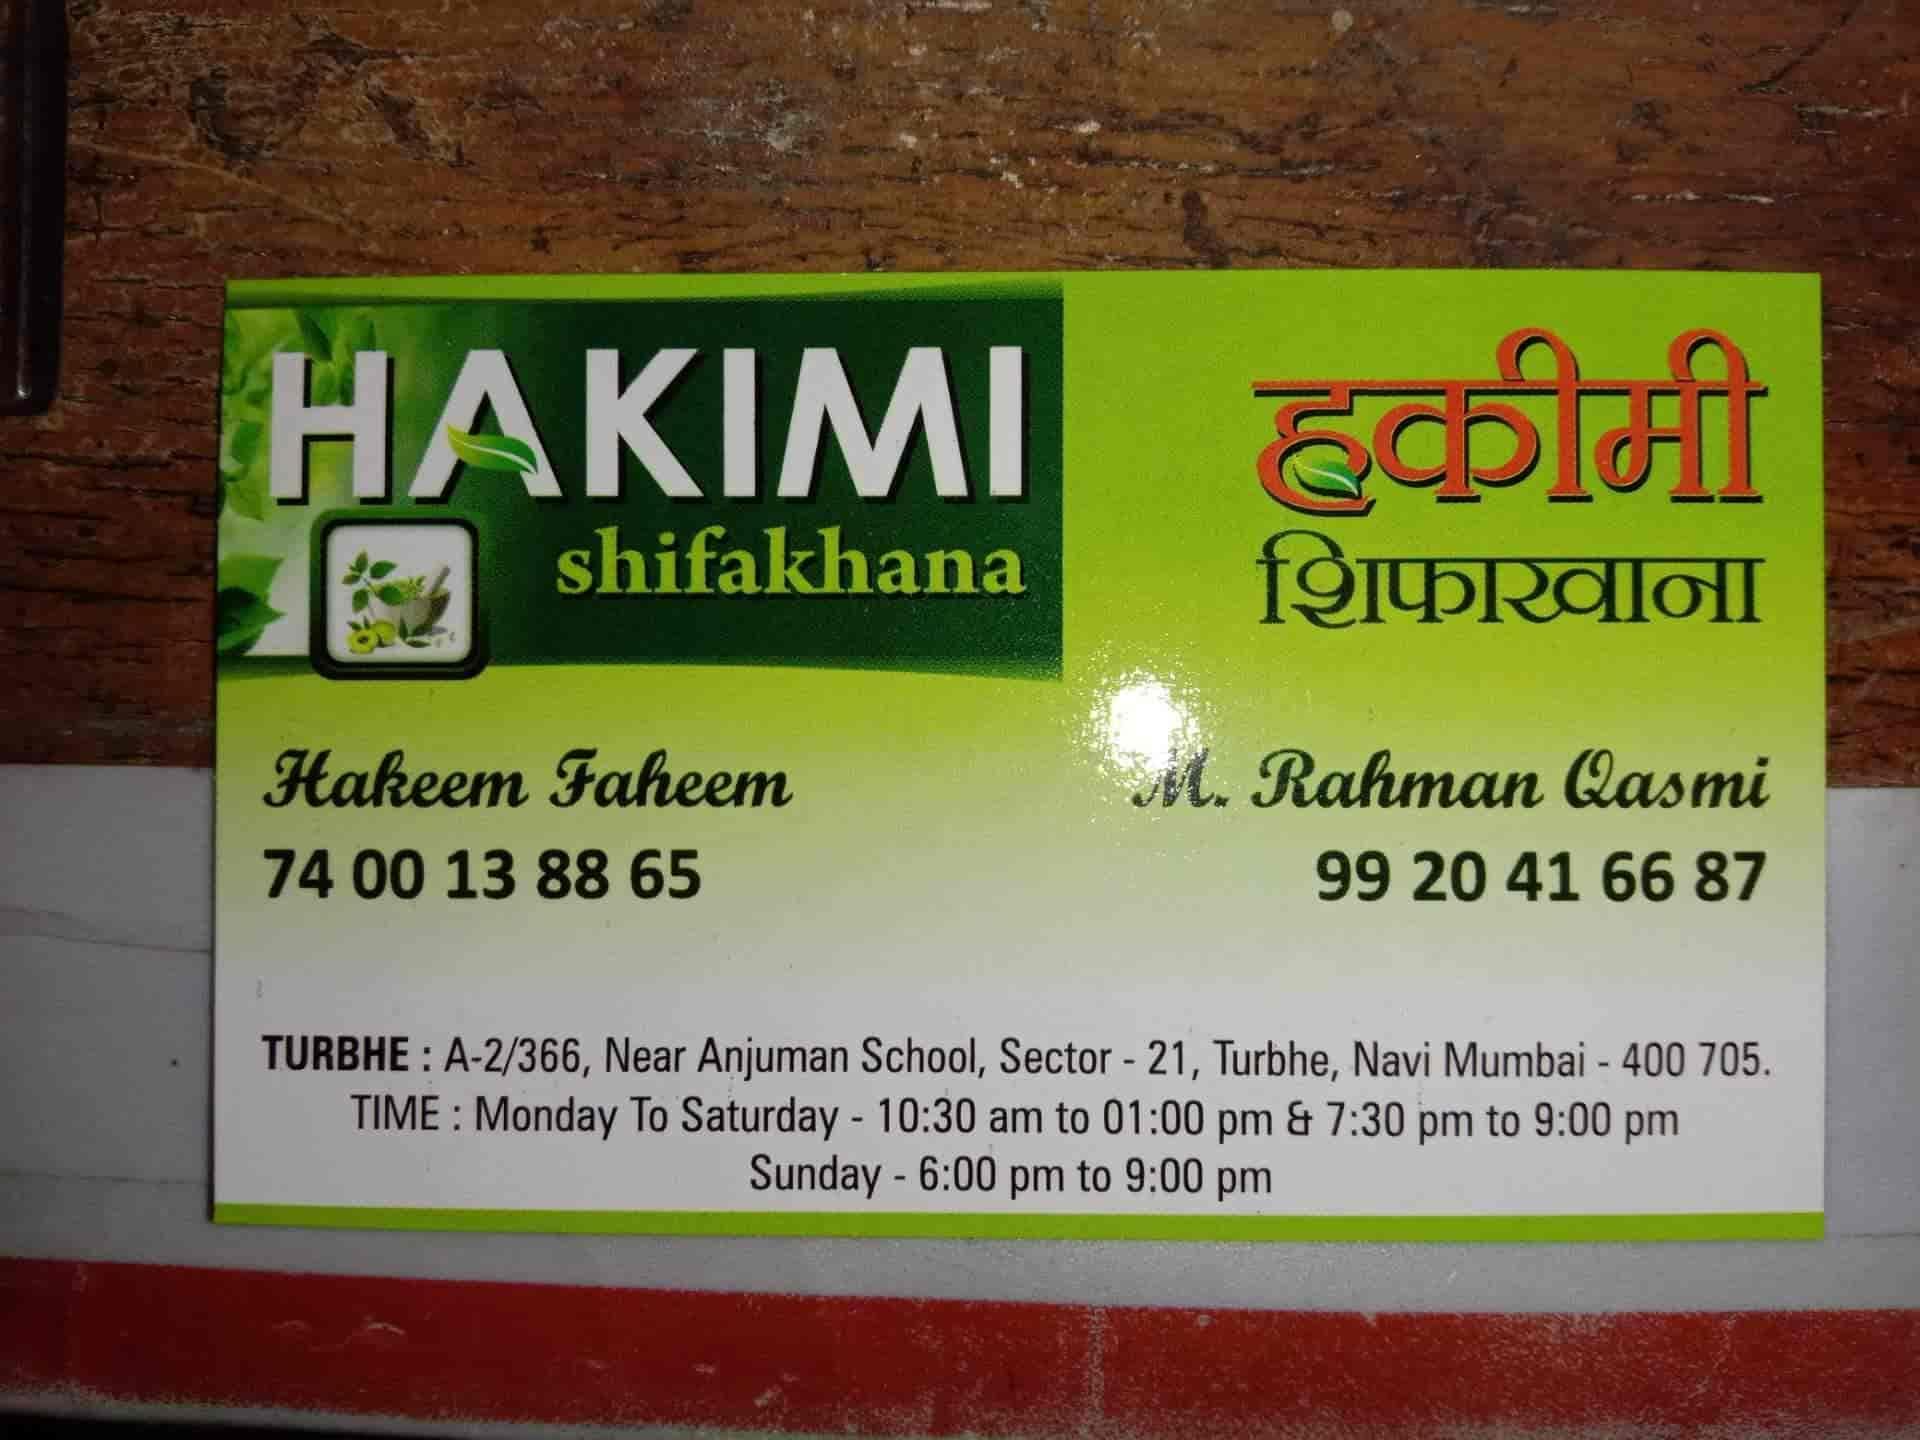 Hakimi Shifakhana, Turbhe - Ayurvedic Medicine Shops in